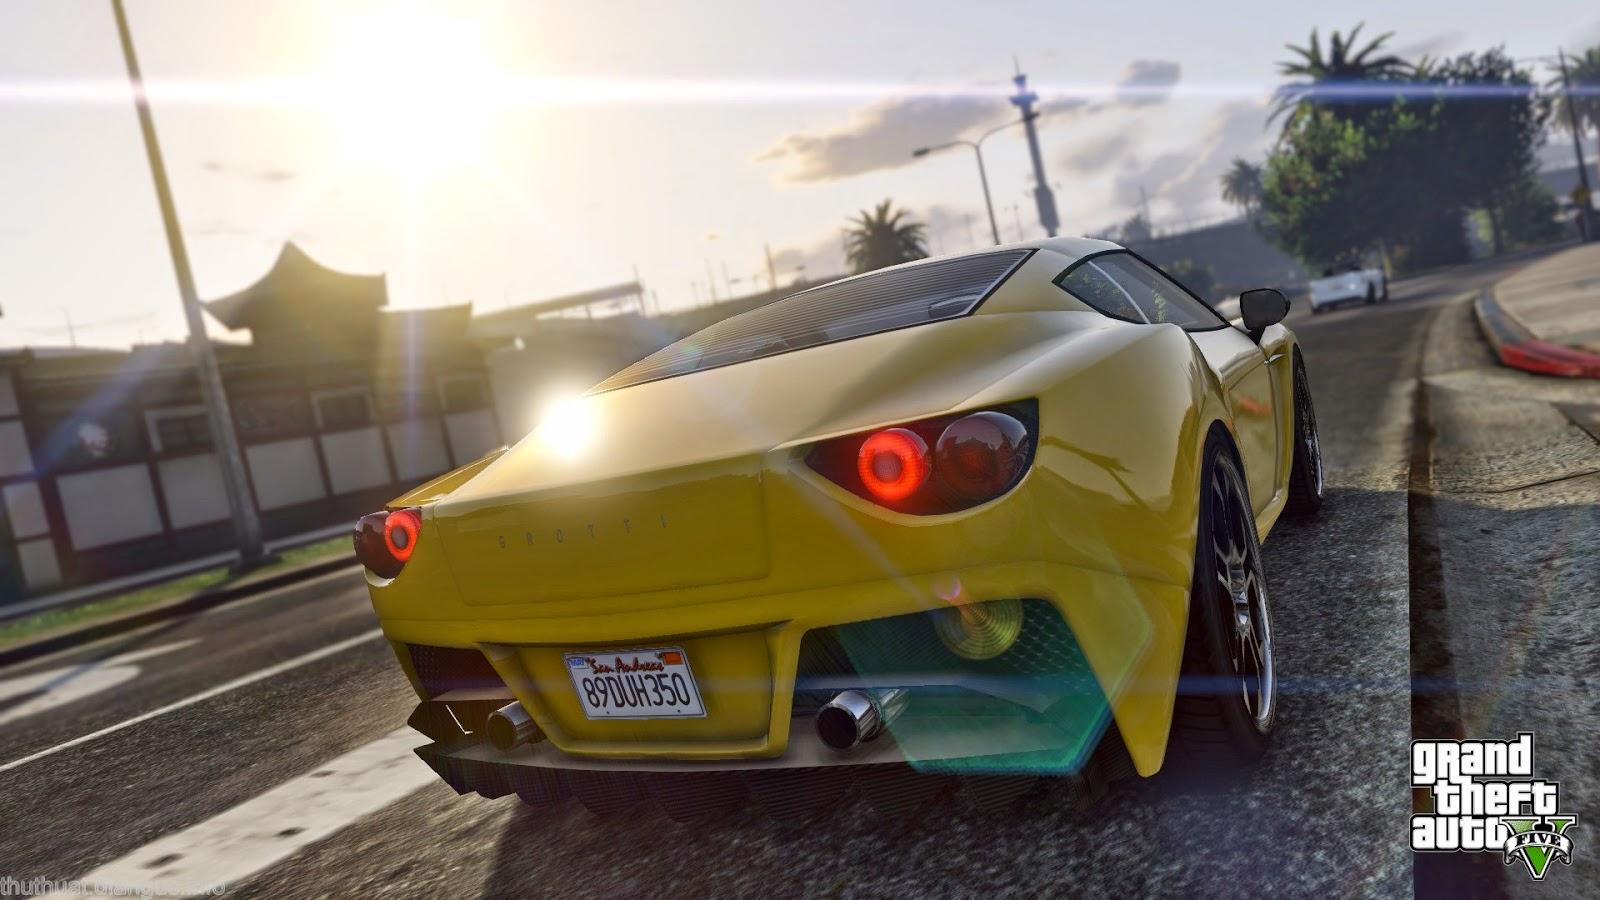 Download GTA IV Final eEvolution 2015 full crack